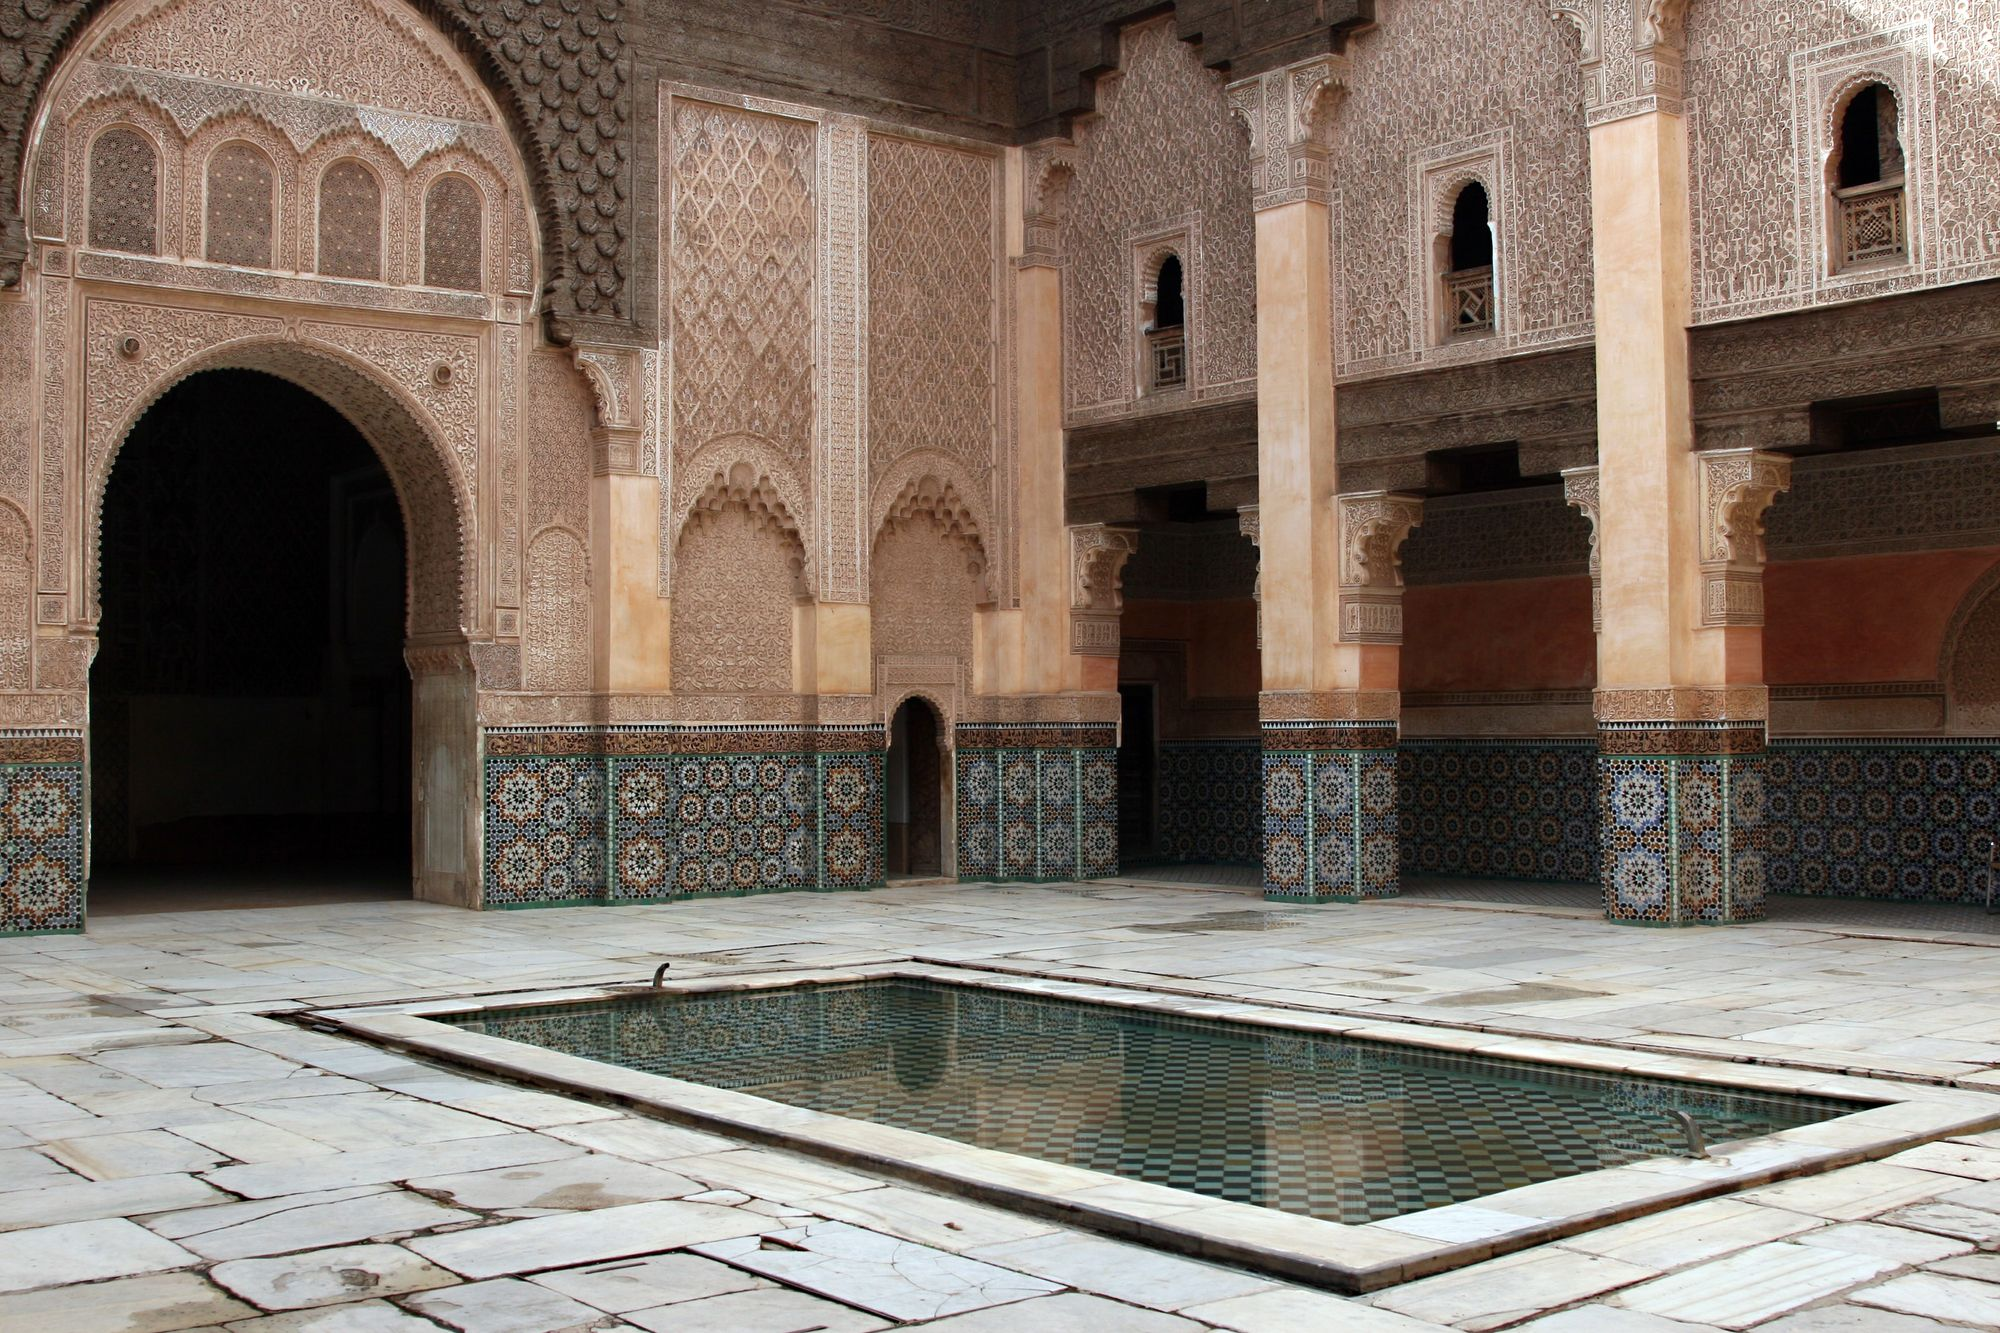 The Ben Youssef Madrasa